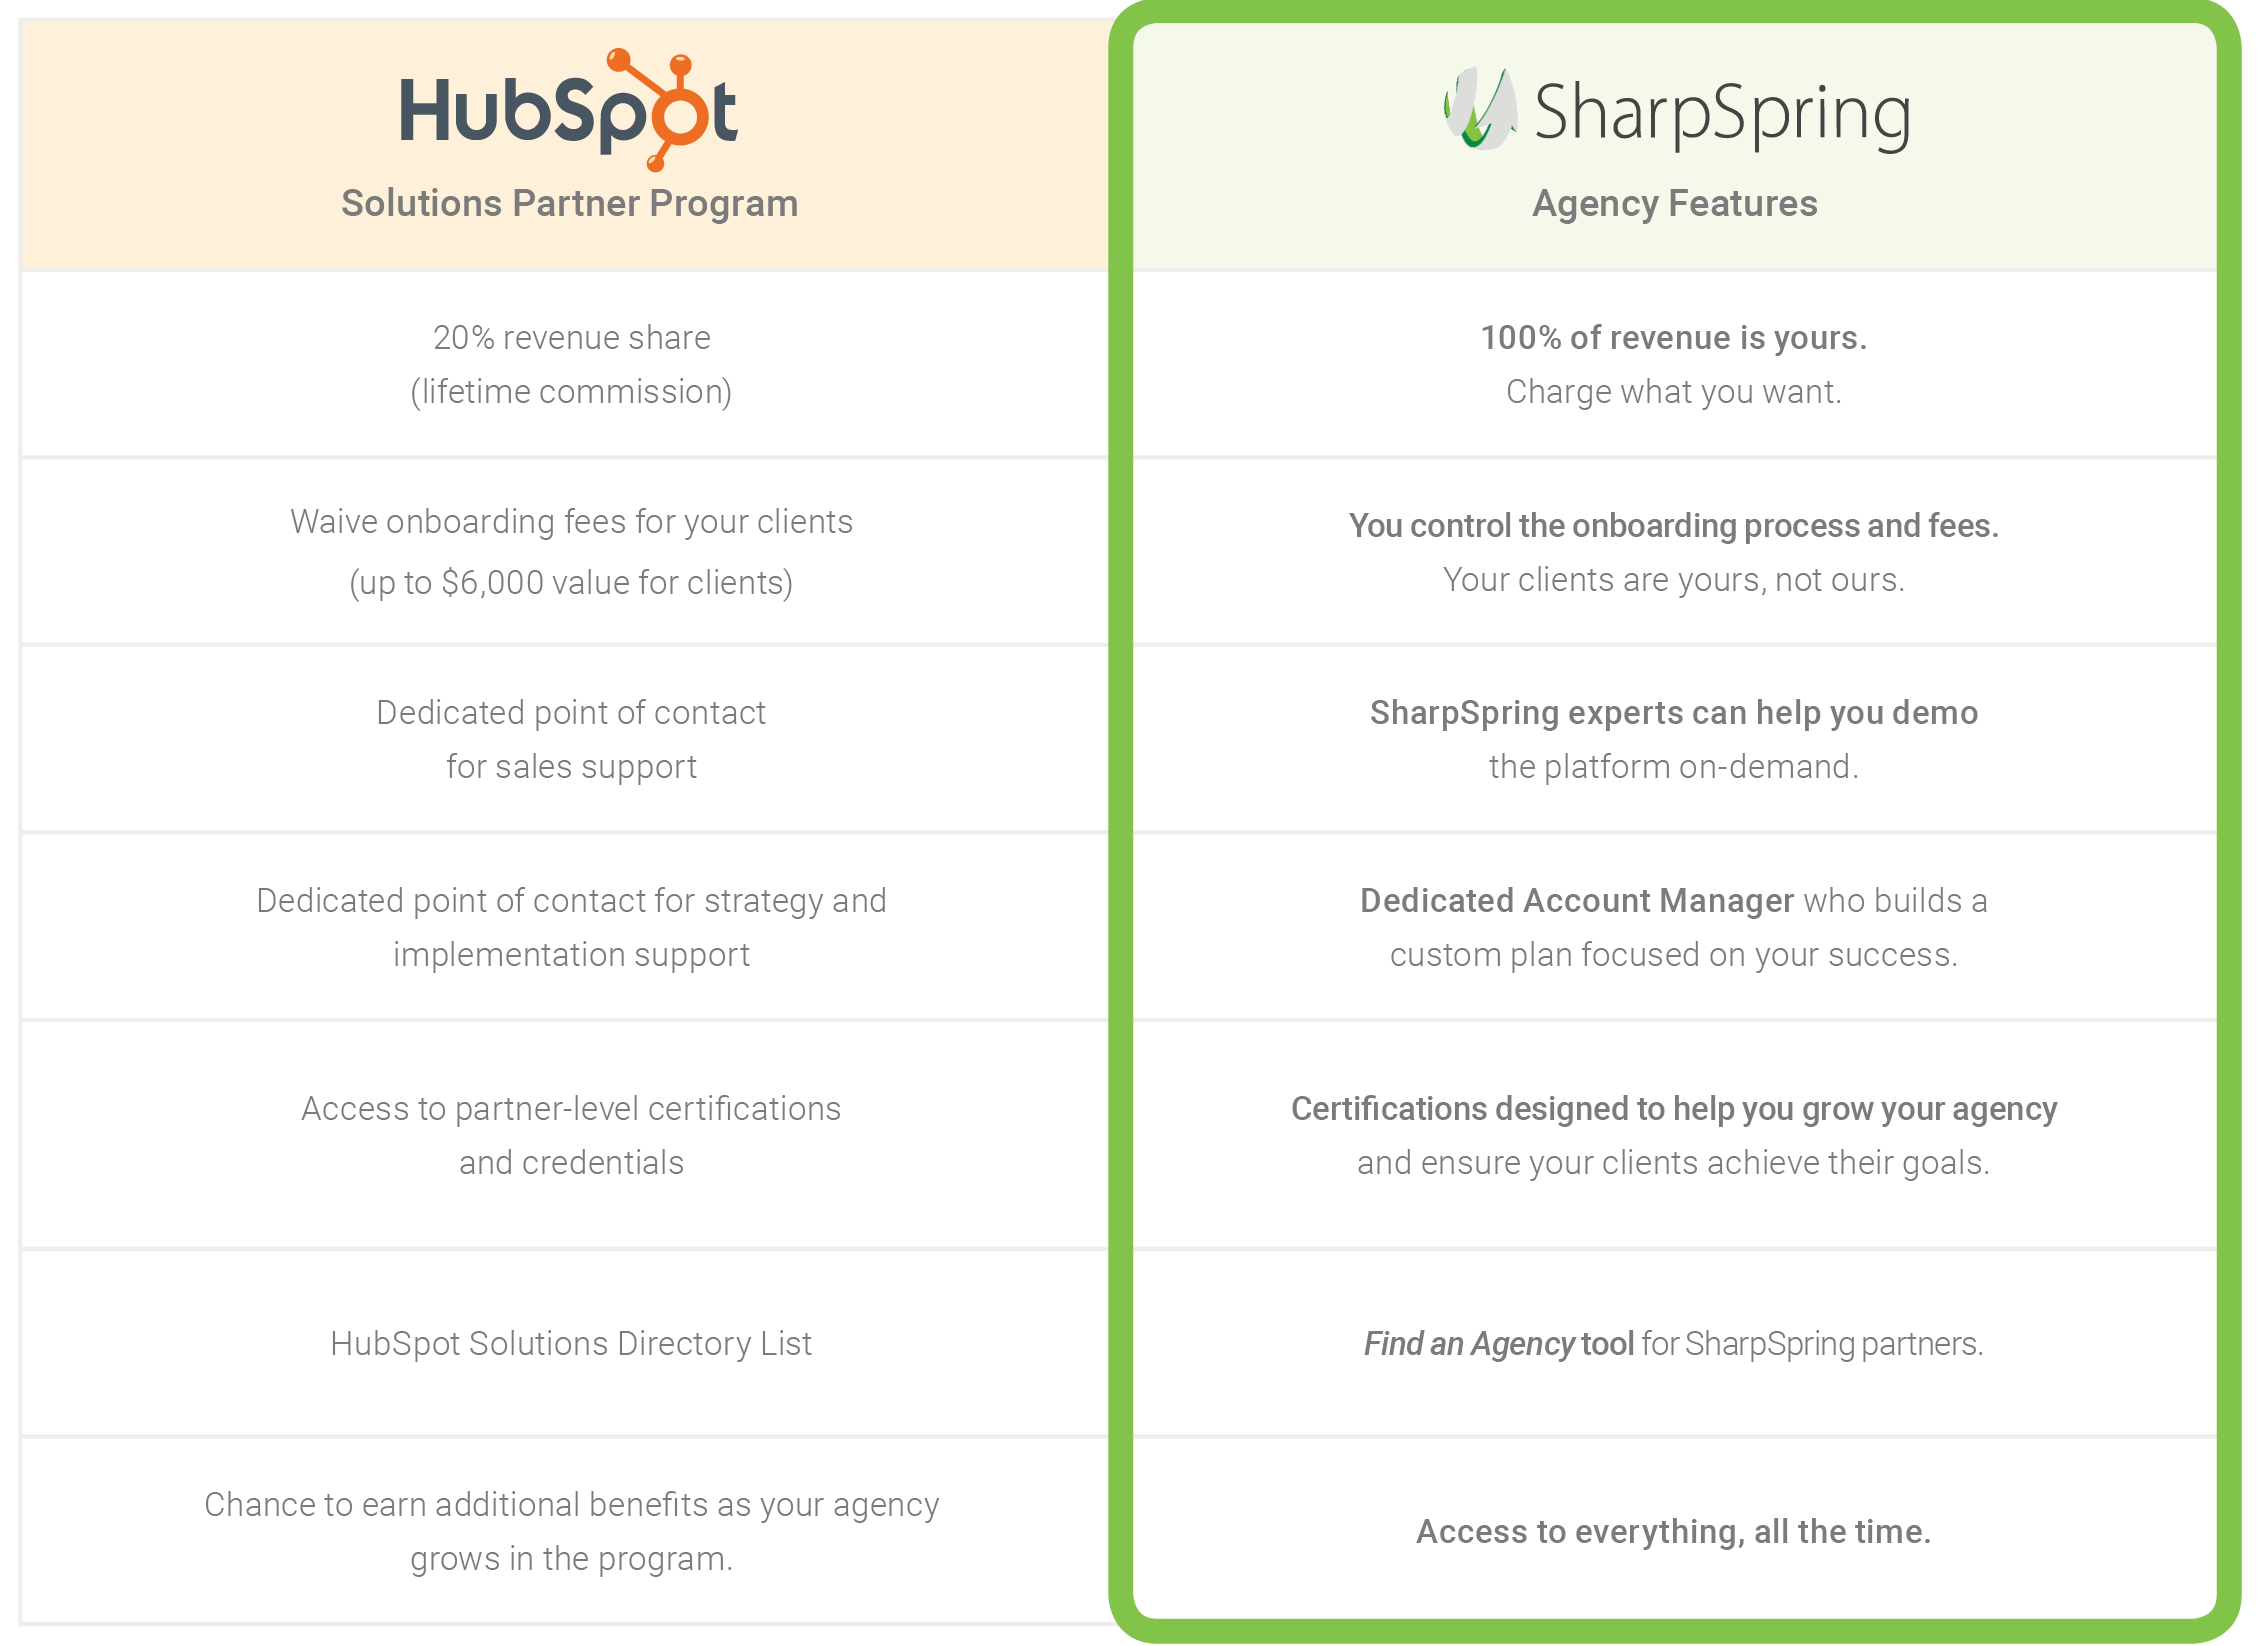 chart describing the advantages of SharpSpring over Hubspot for agencies